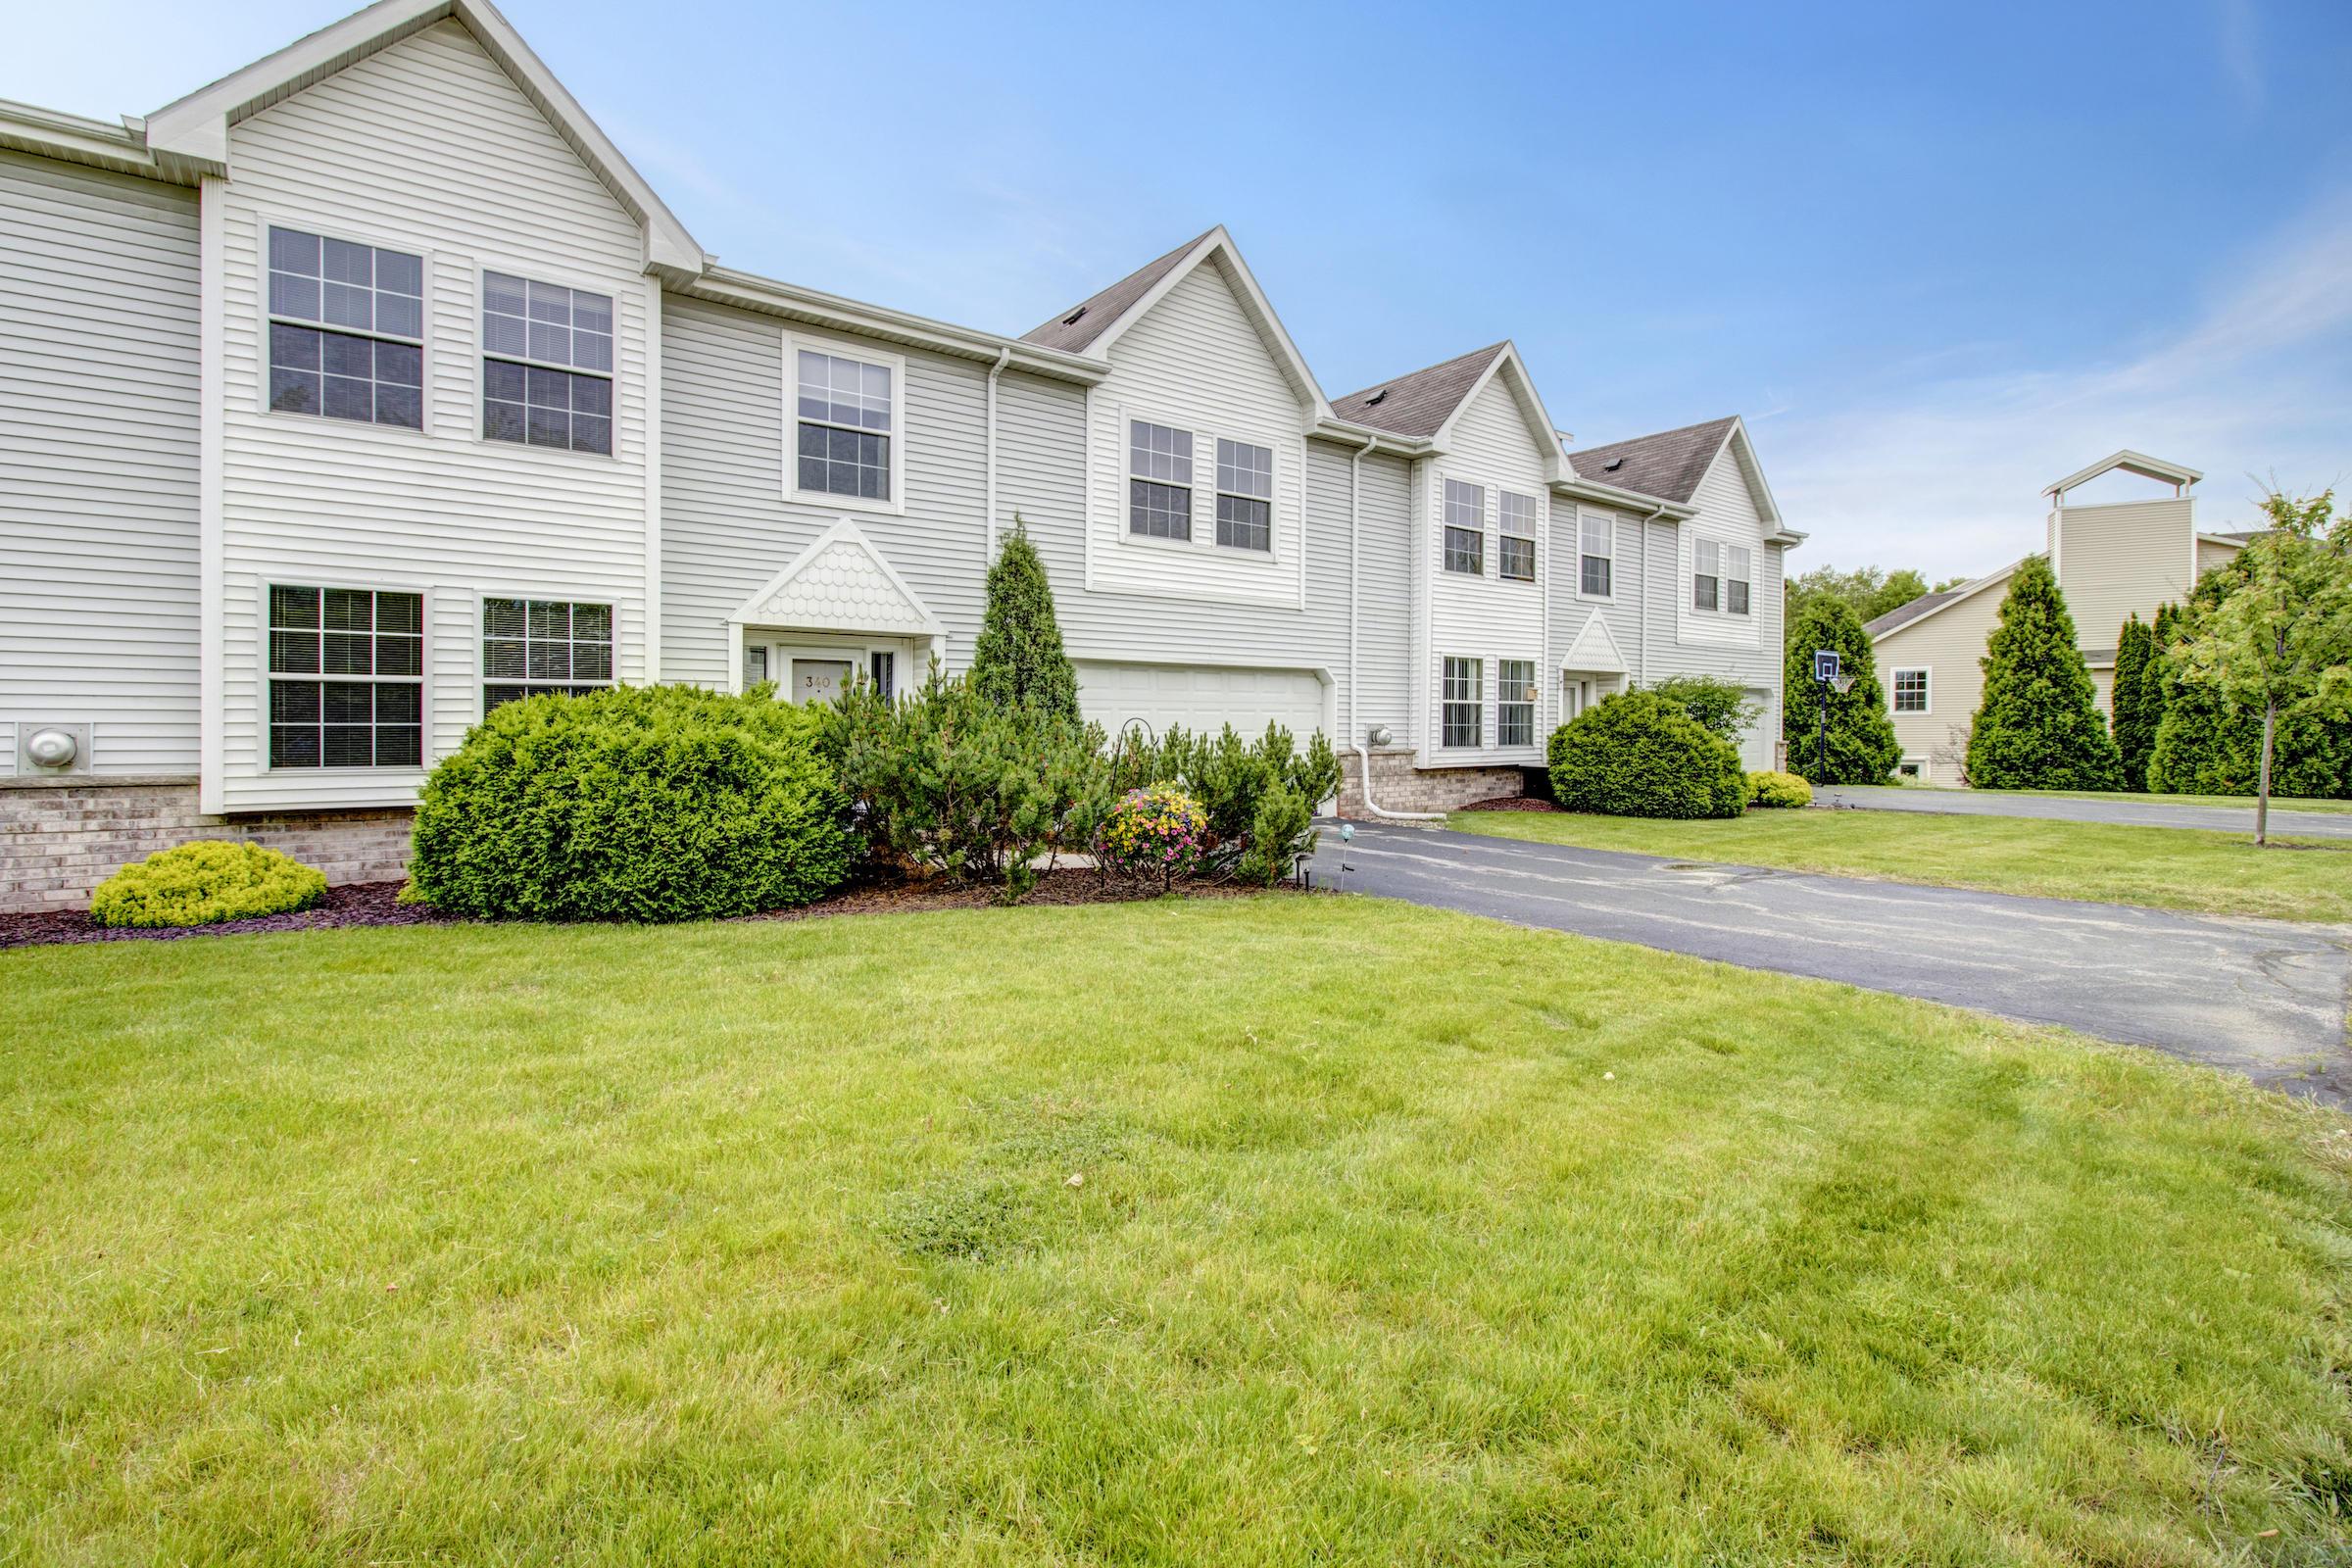 340 Jennifer Ln, Brookfield, Wisconsin 53045, 3 Bedrooms Bedrooms, ,2 BathroomsBathrooms,Condominiums,For Sale,Jennifer Ln,1,1643461